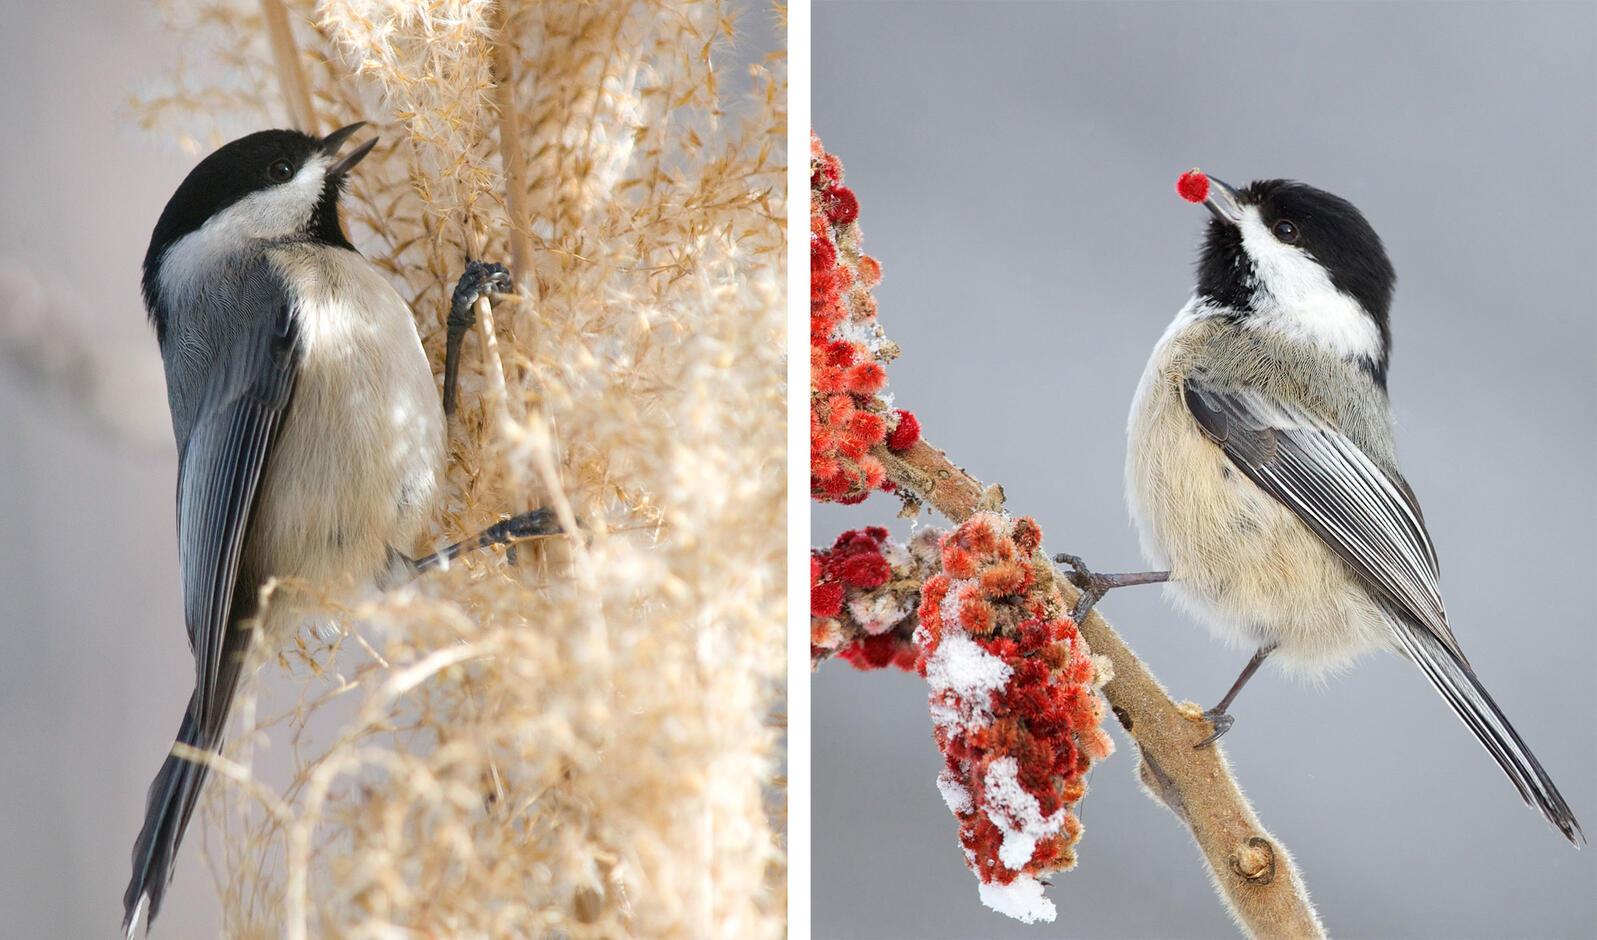 Left: Carolina Chickadee. Photo: Michele Ising Black/Great Backyard Bird Count. Right: Black-capped Chickadee. Photo: Missy Mandel/Great Backyard Bird Count